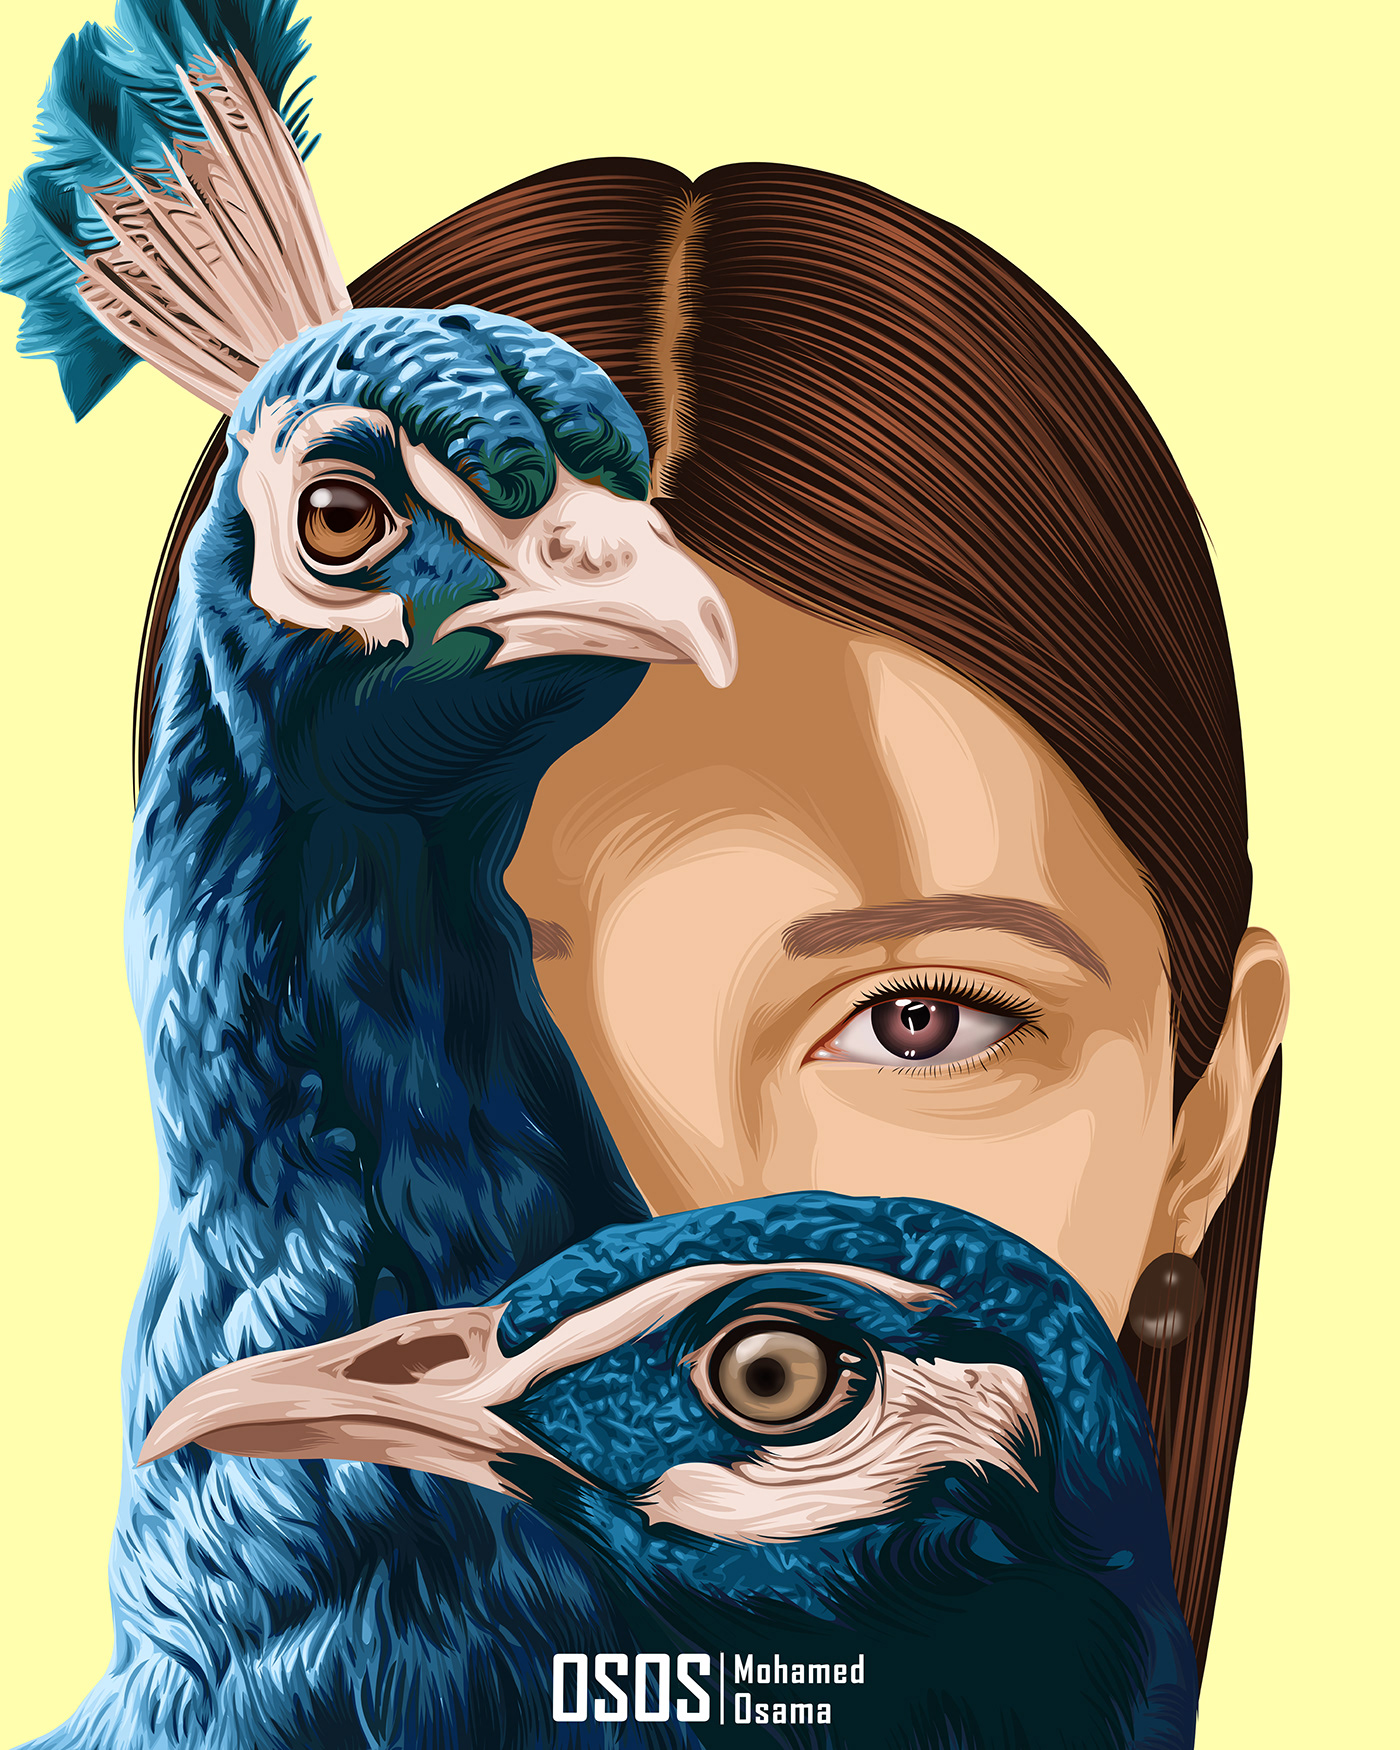 Image may contain: cartoon, bird and sketch